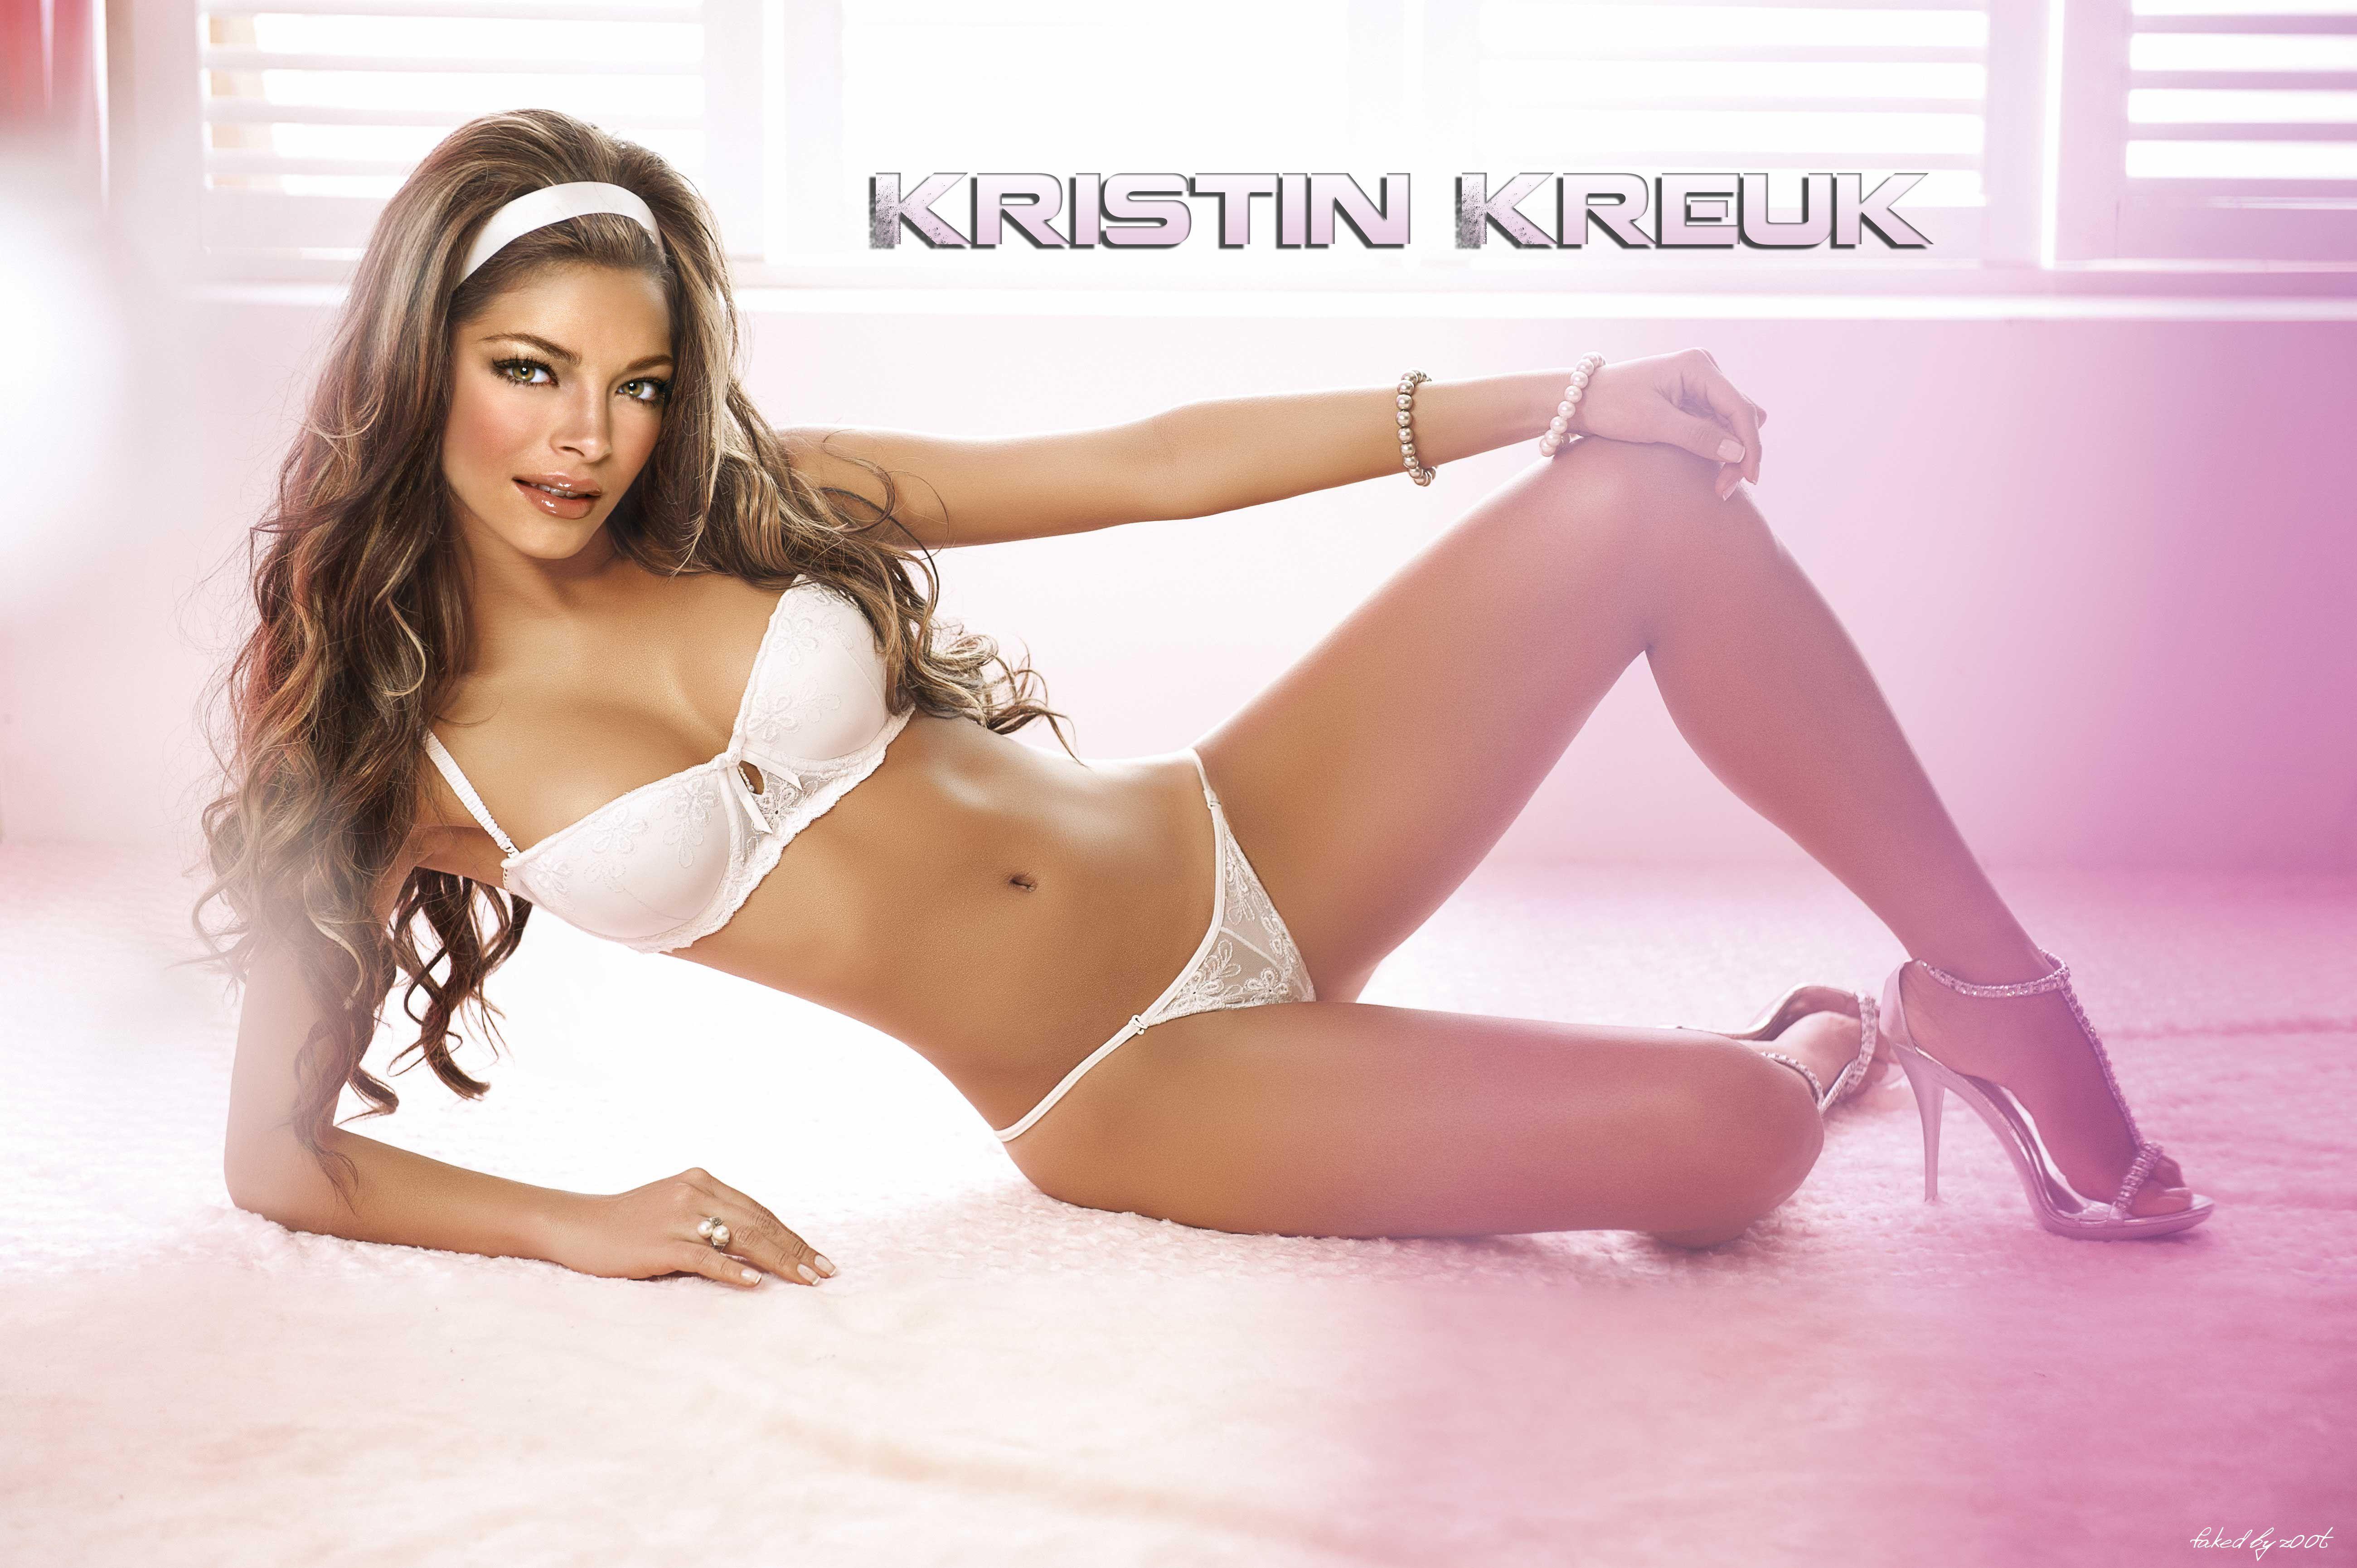 Kristin kreuk beach bikini